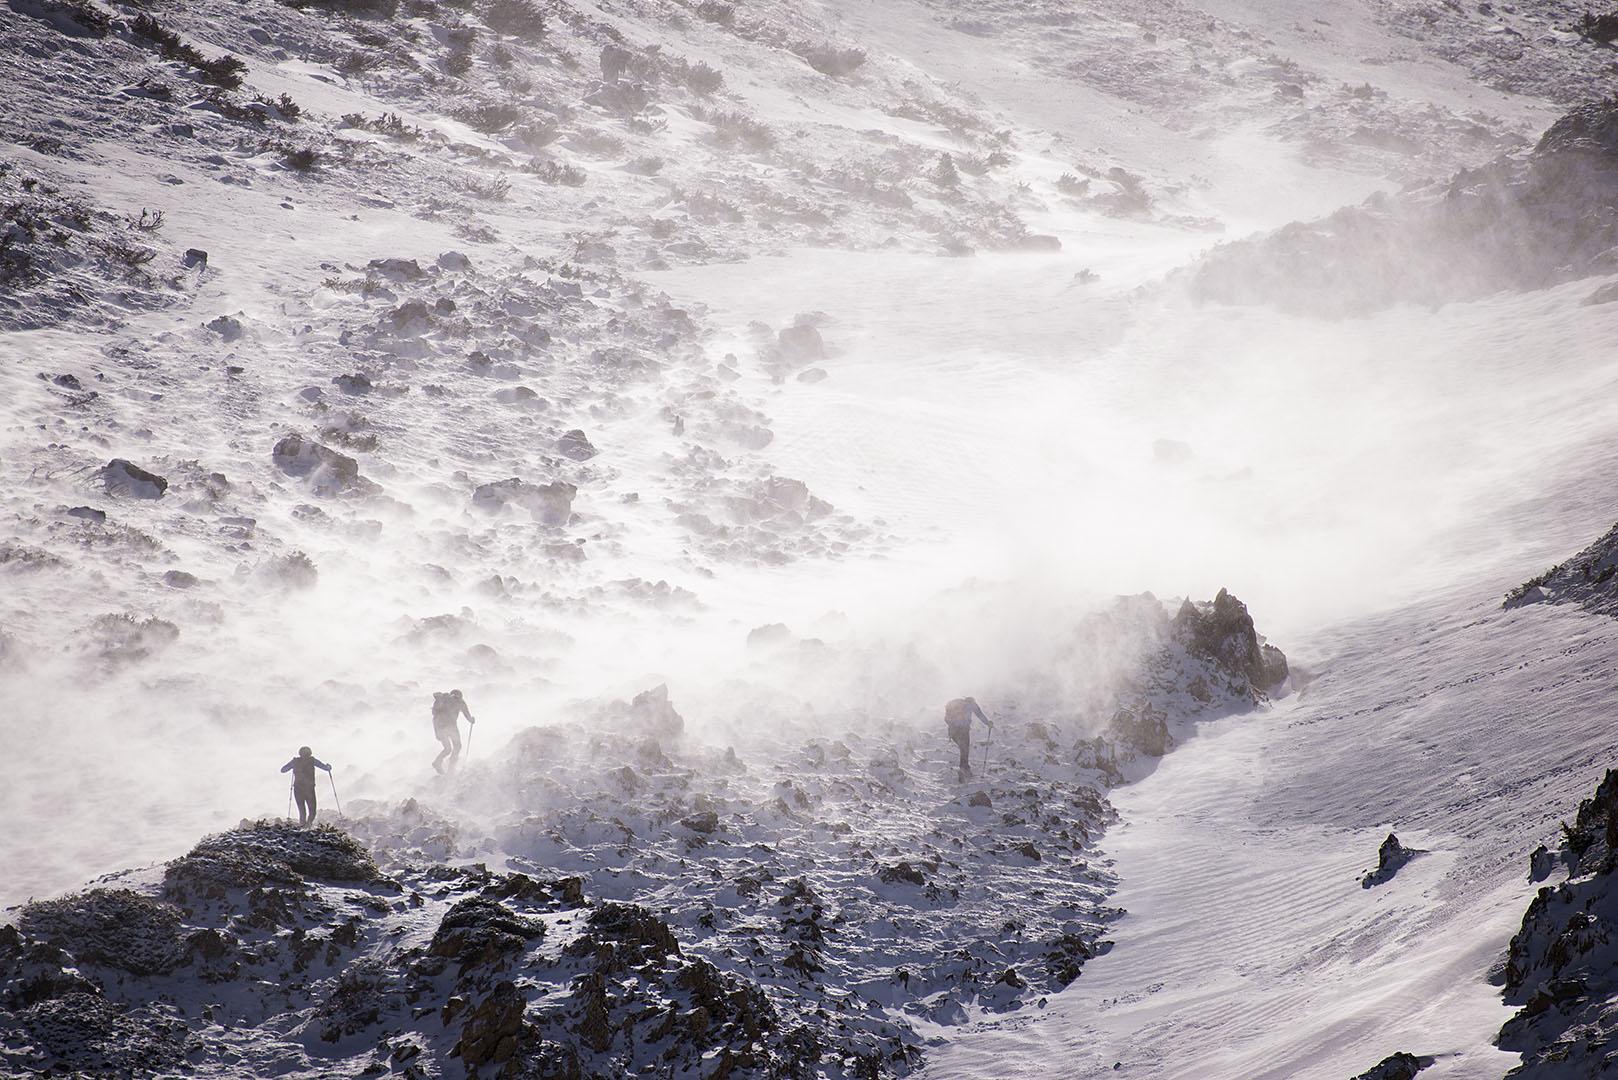 La ventisca - Deportes y aventuras - Inaki Larrea, Nature and mountains Photography